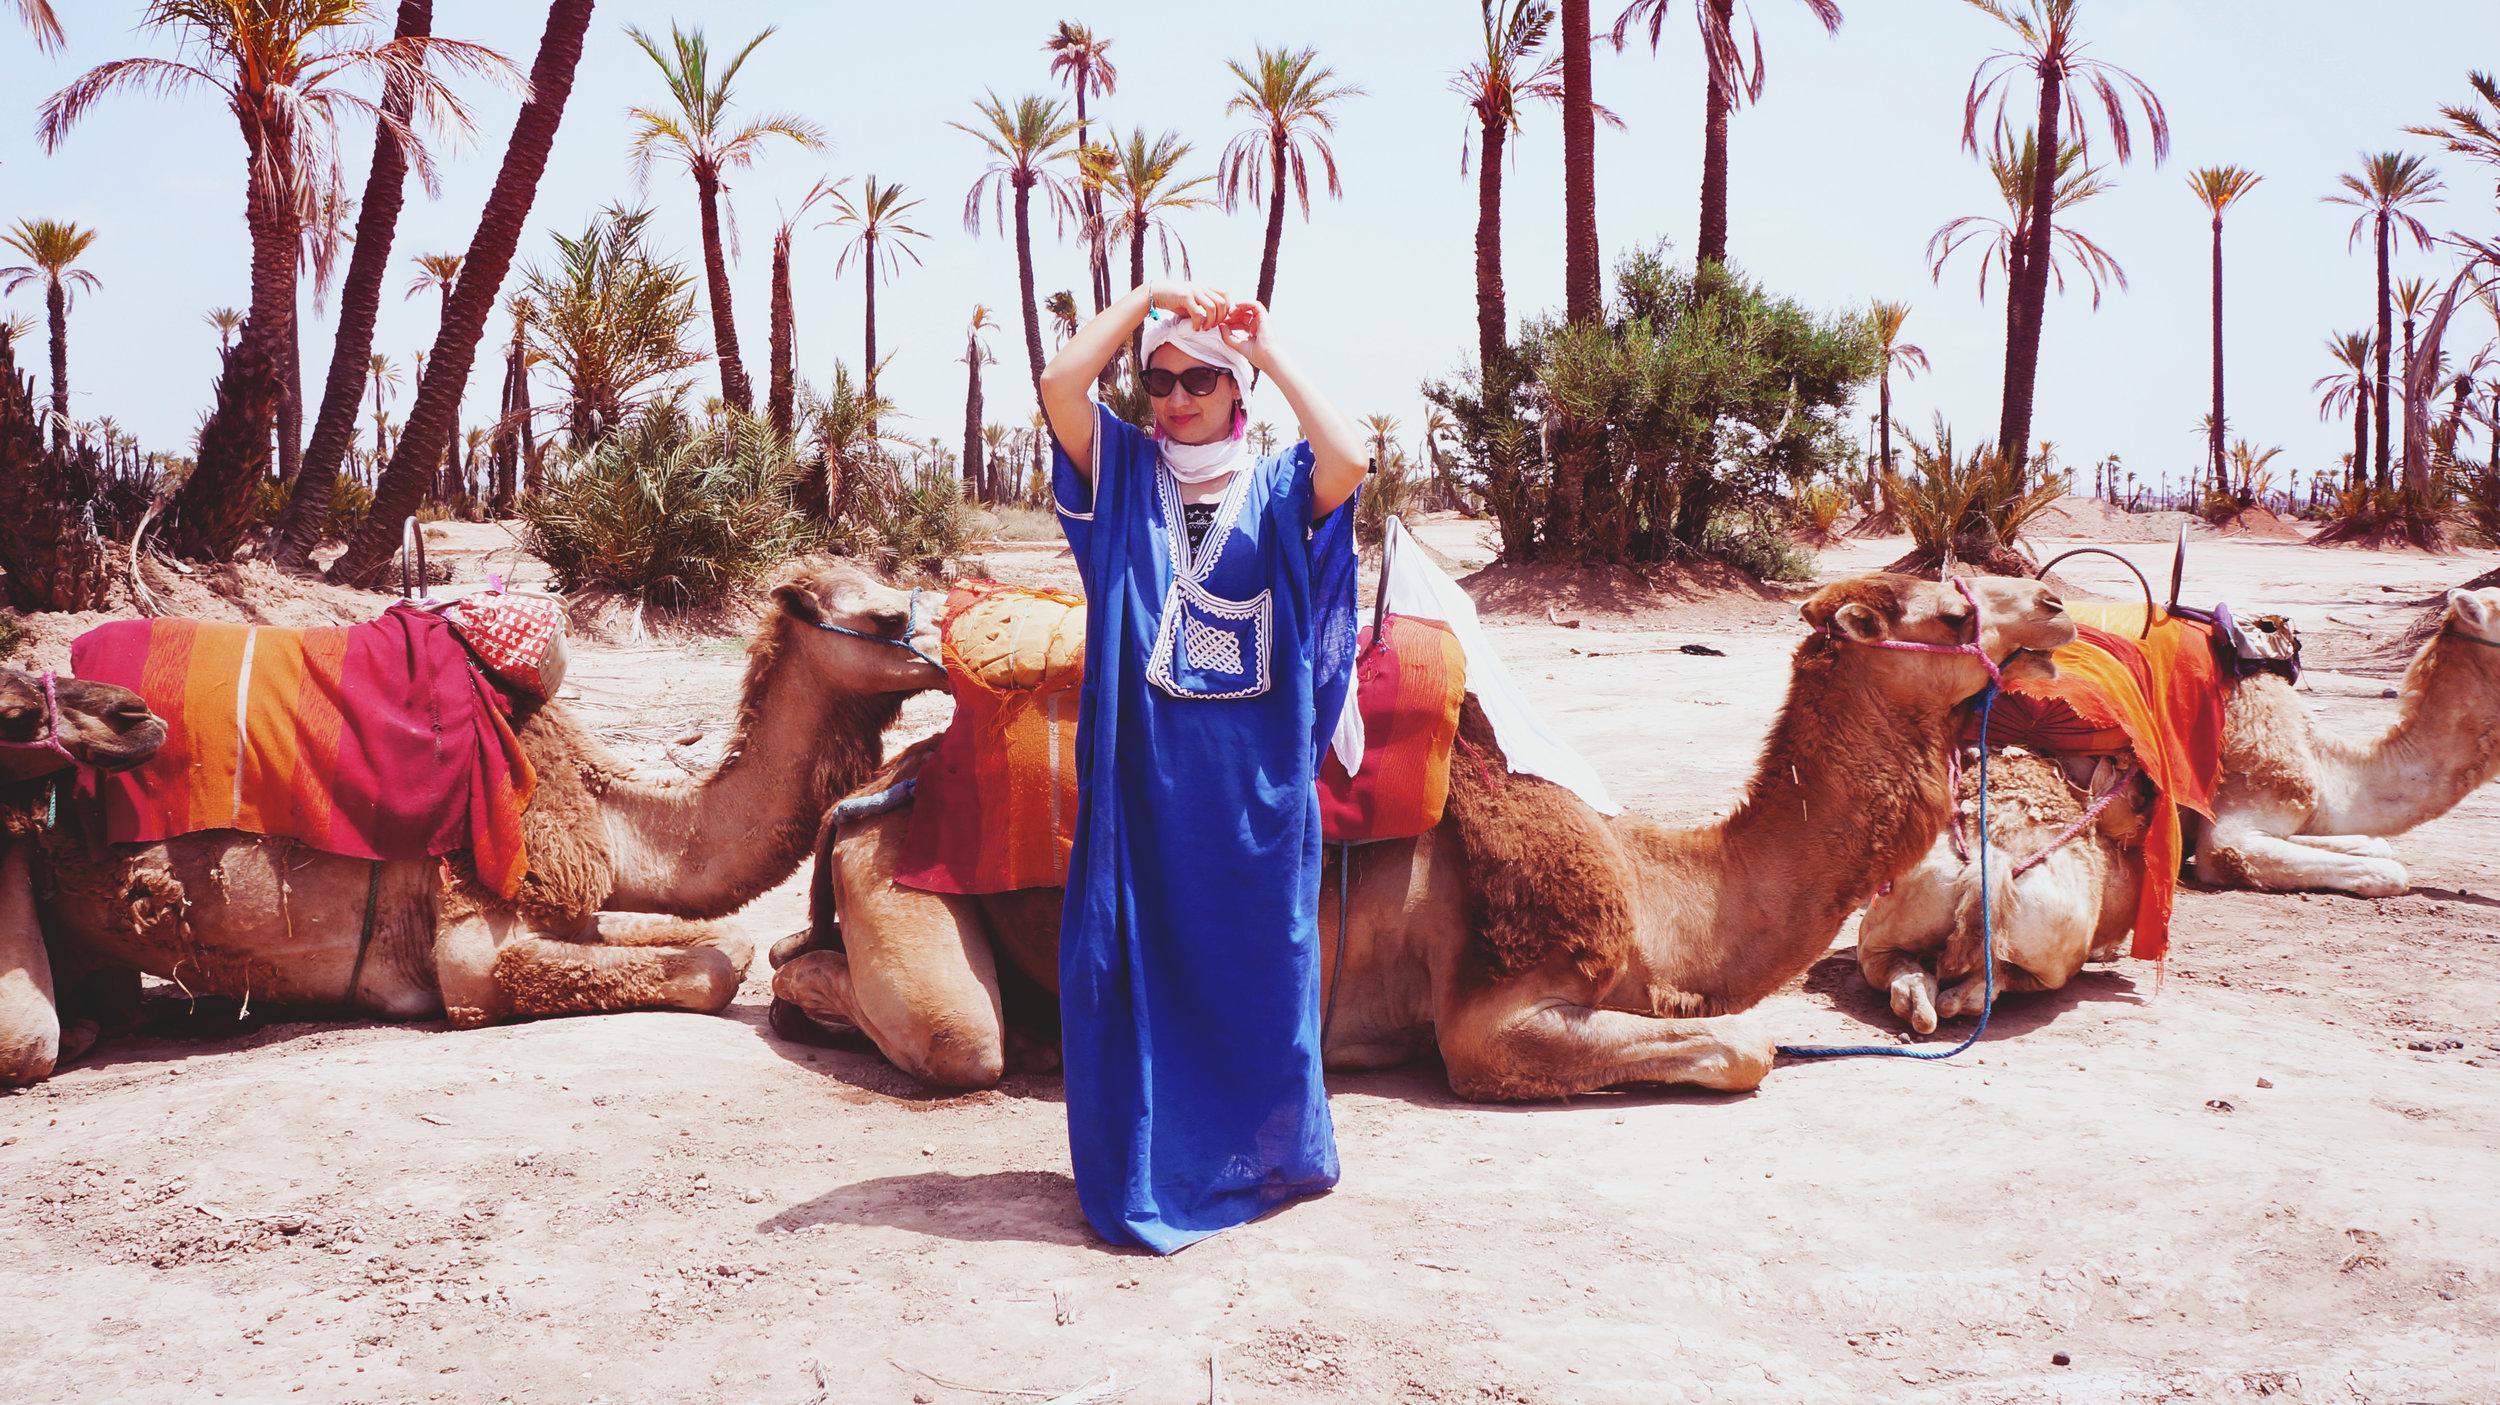 Camel ride excursion booked through Riad Kaiss